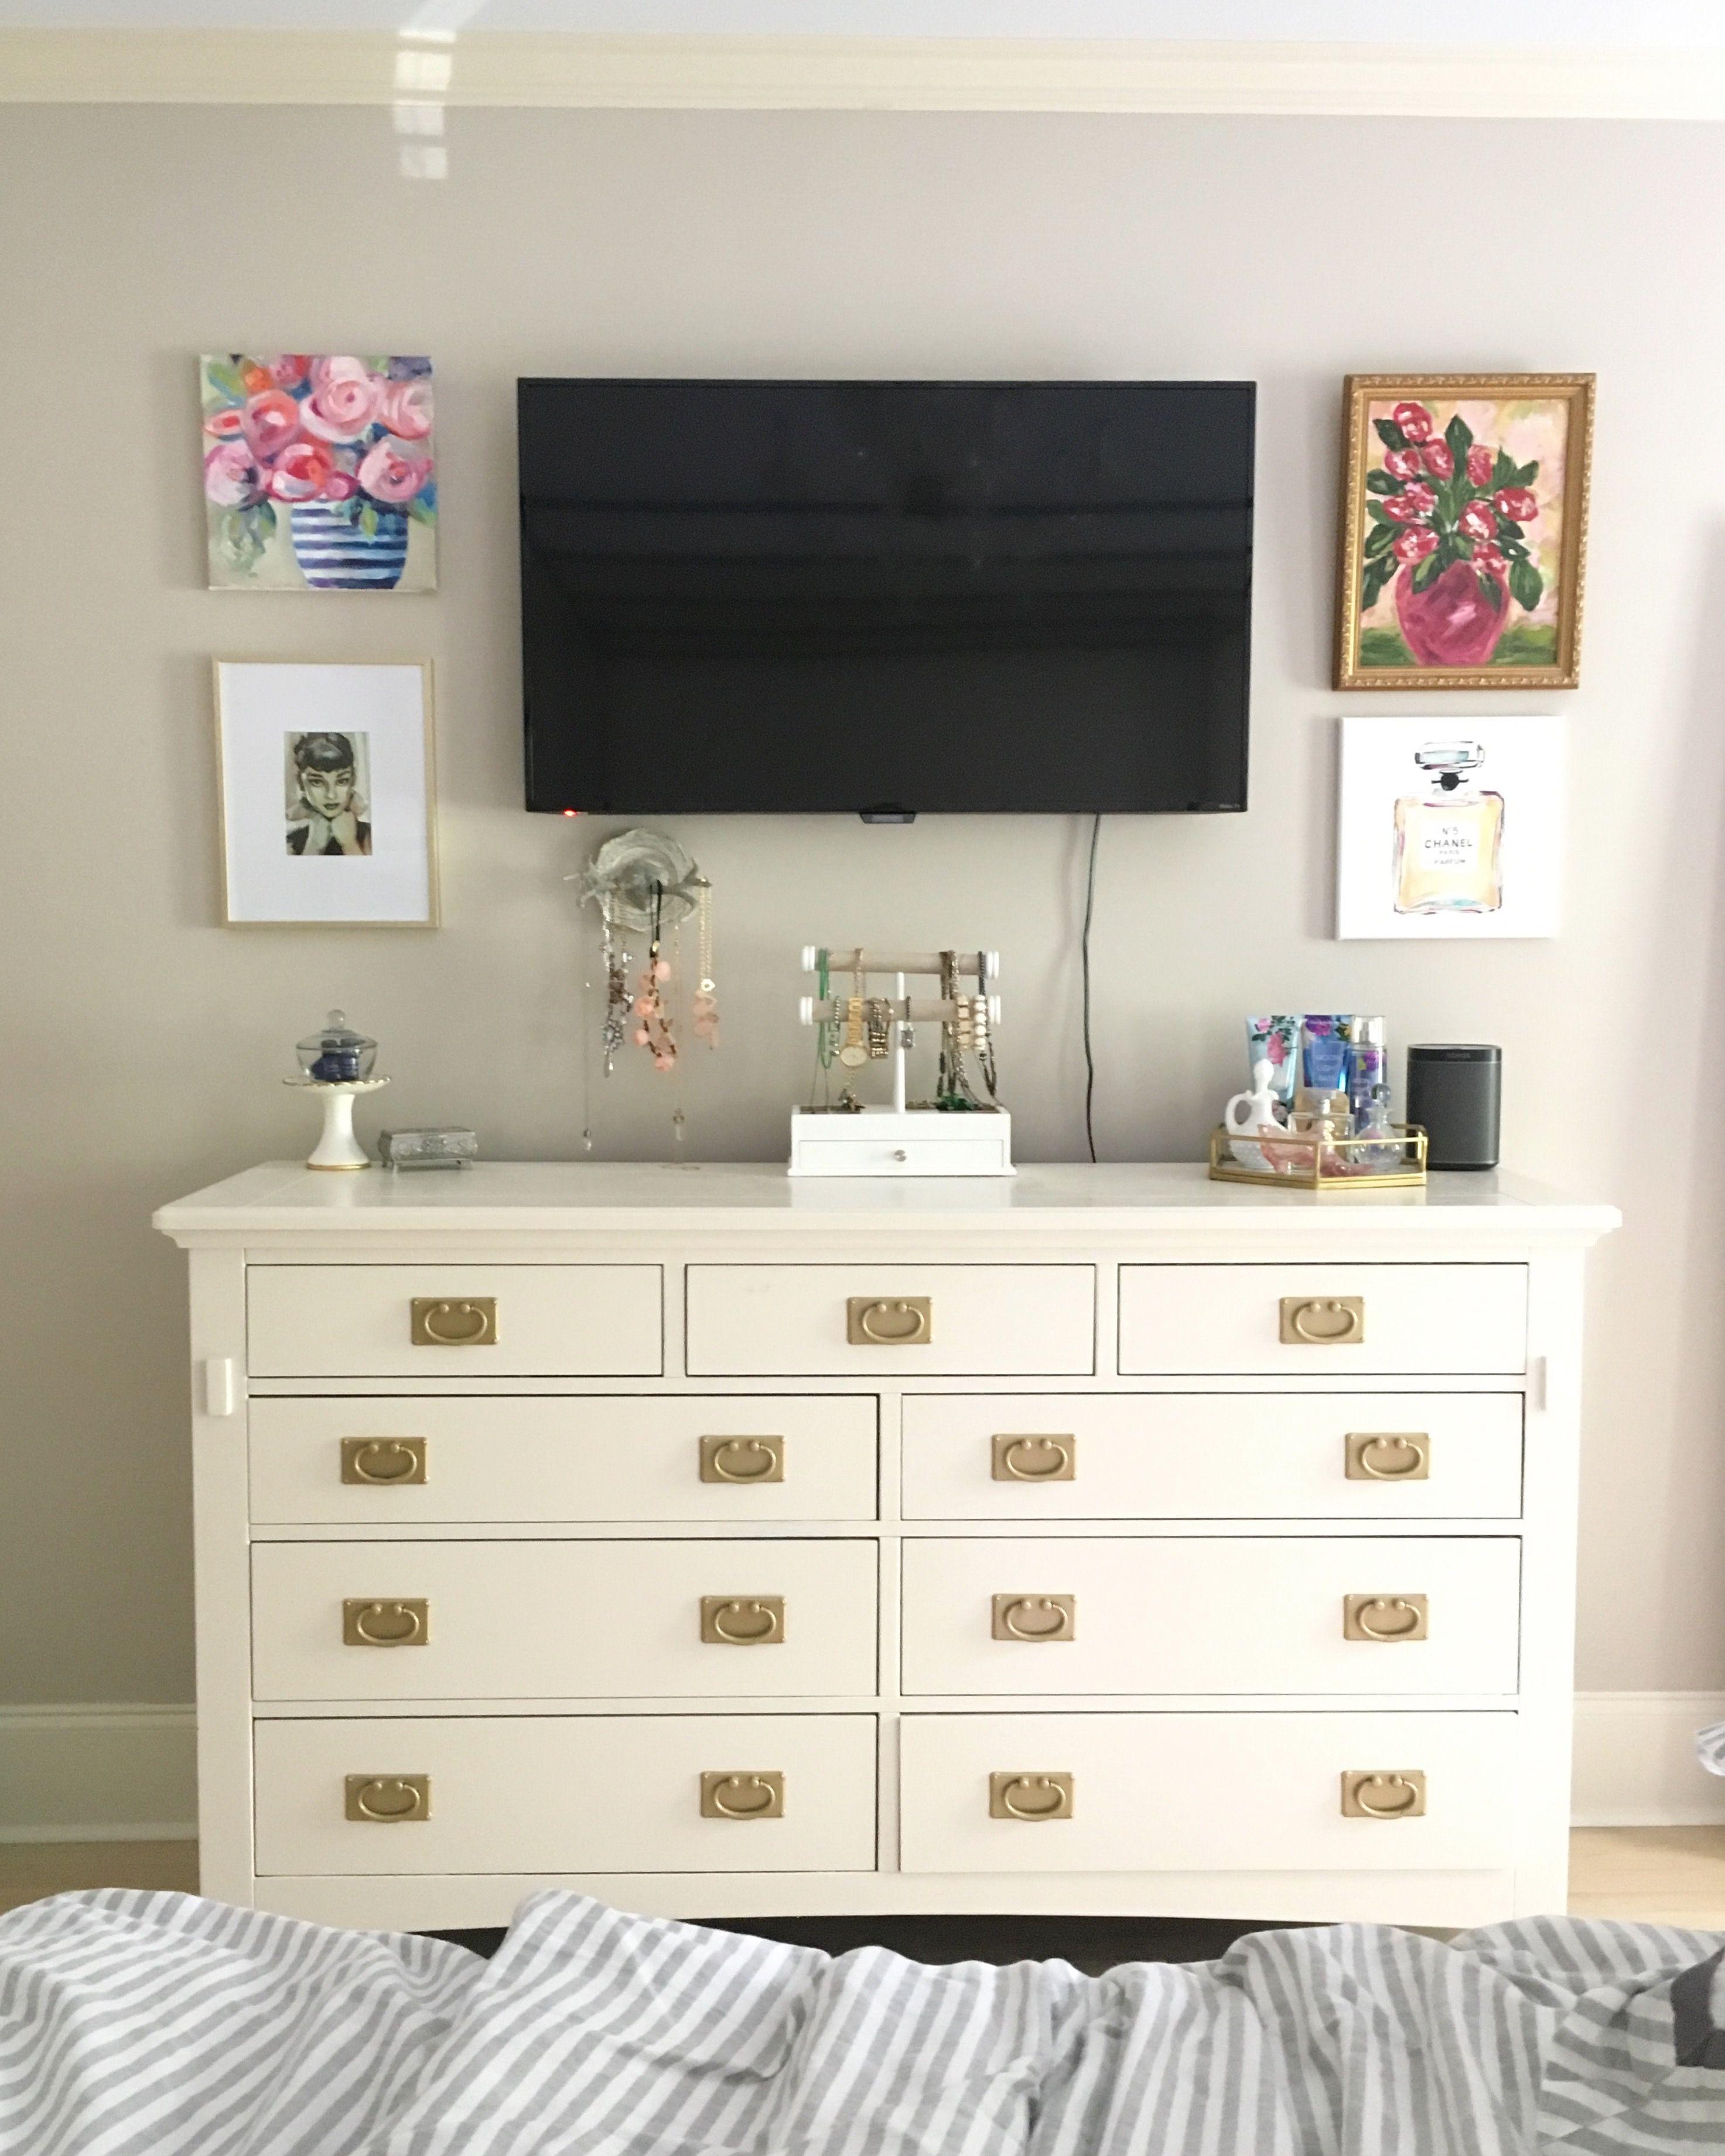 Tv Over Dresser In Bedroom Dresser Decor Bedroom Master Bedroom Makeover Bedroom Makeover